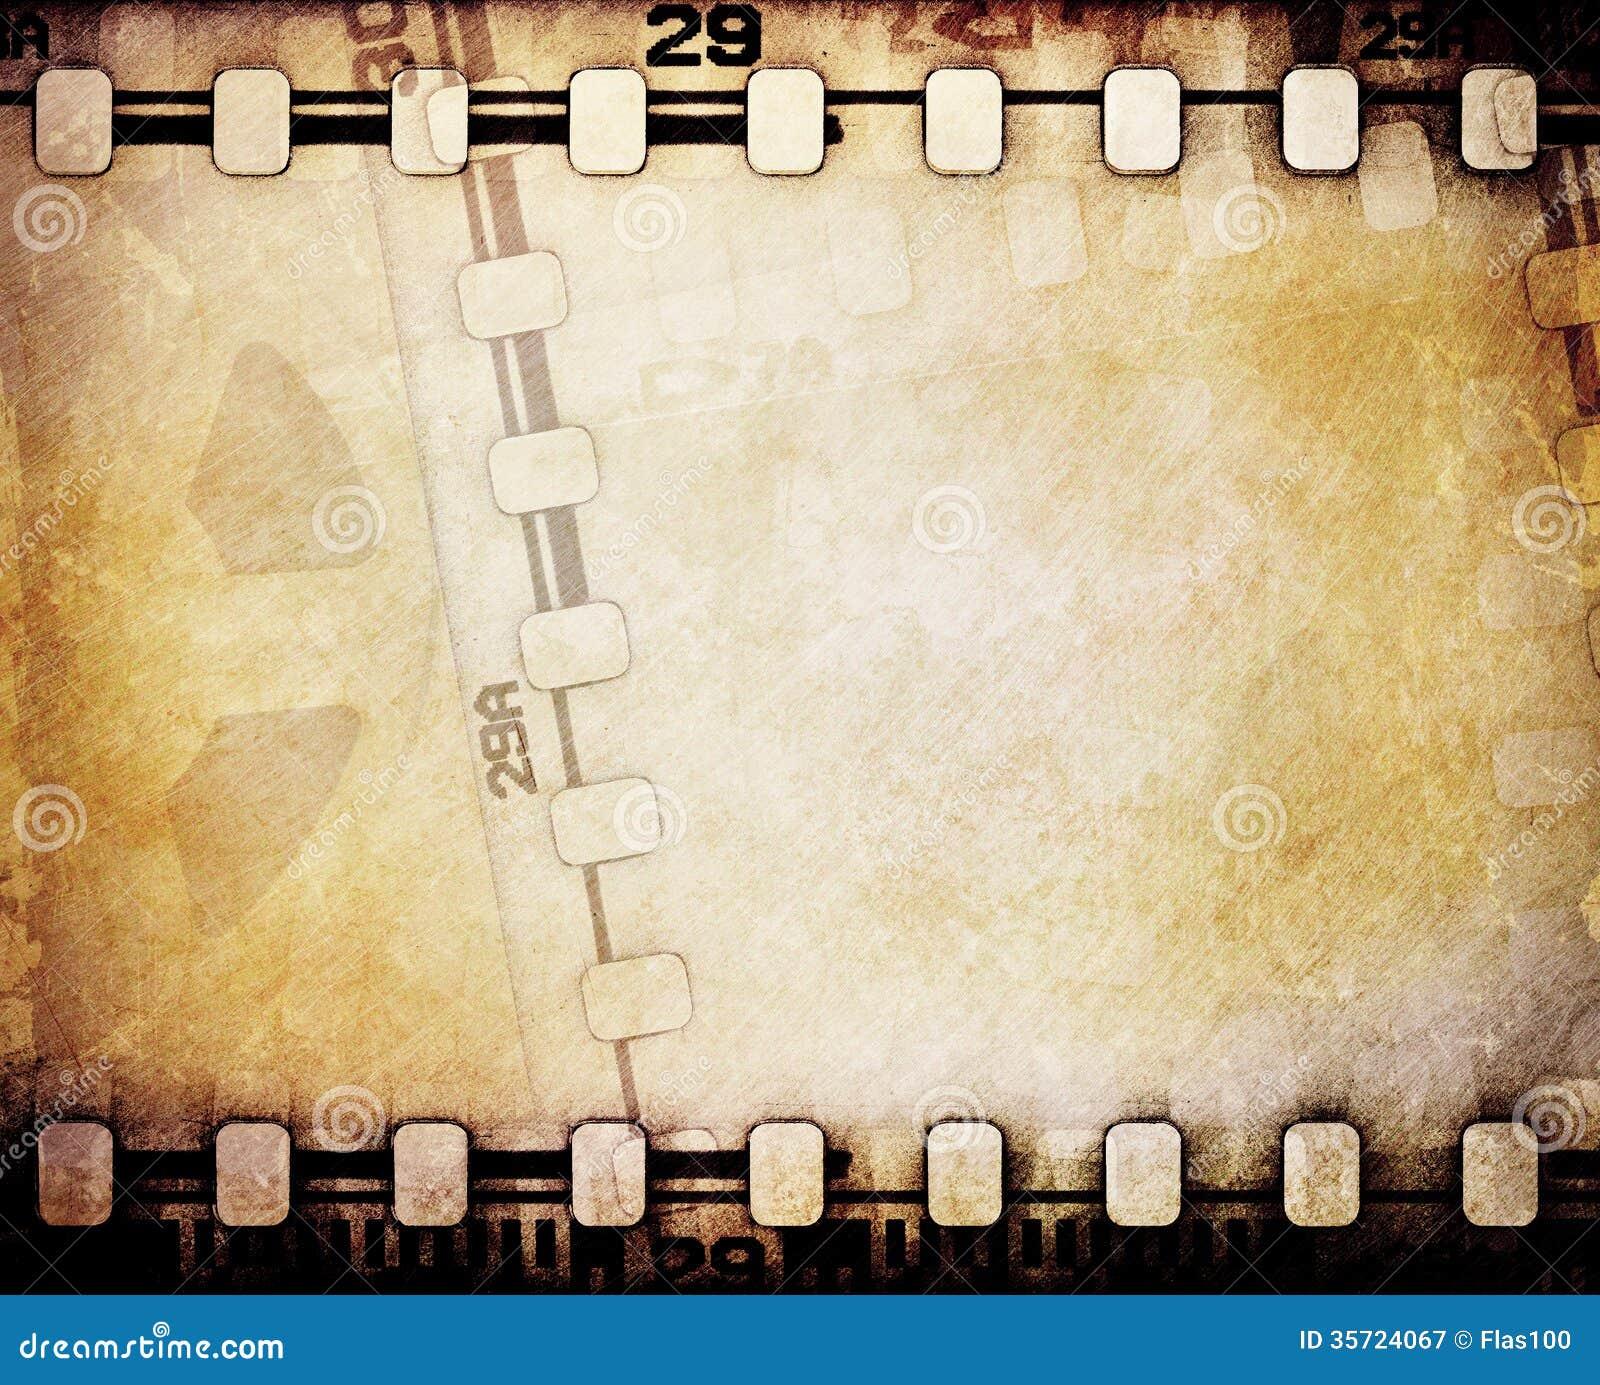 clipart pellicola cinematografica - photo #42